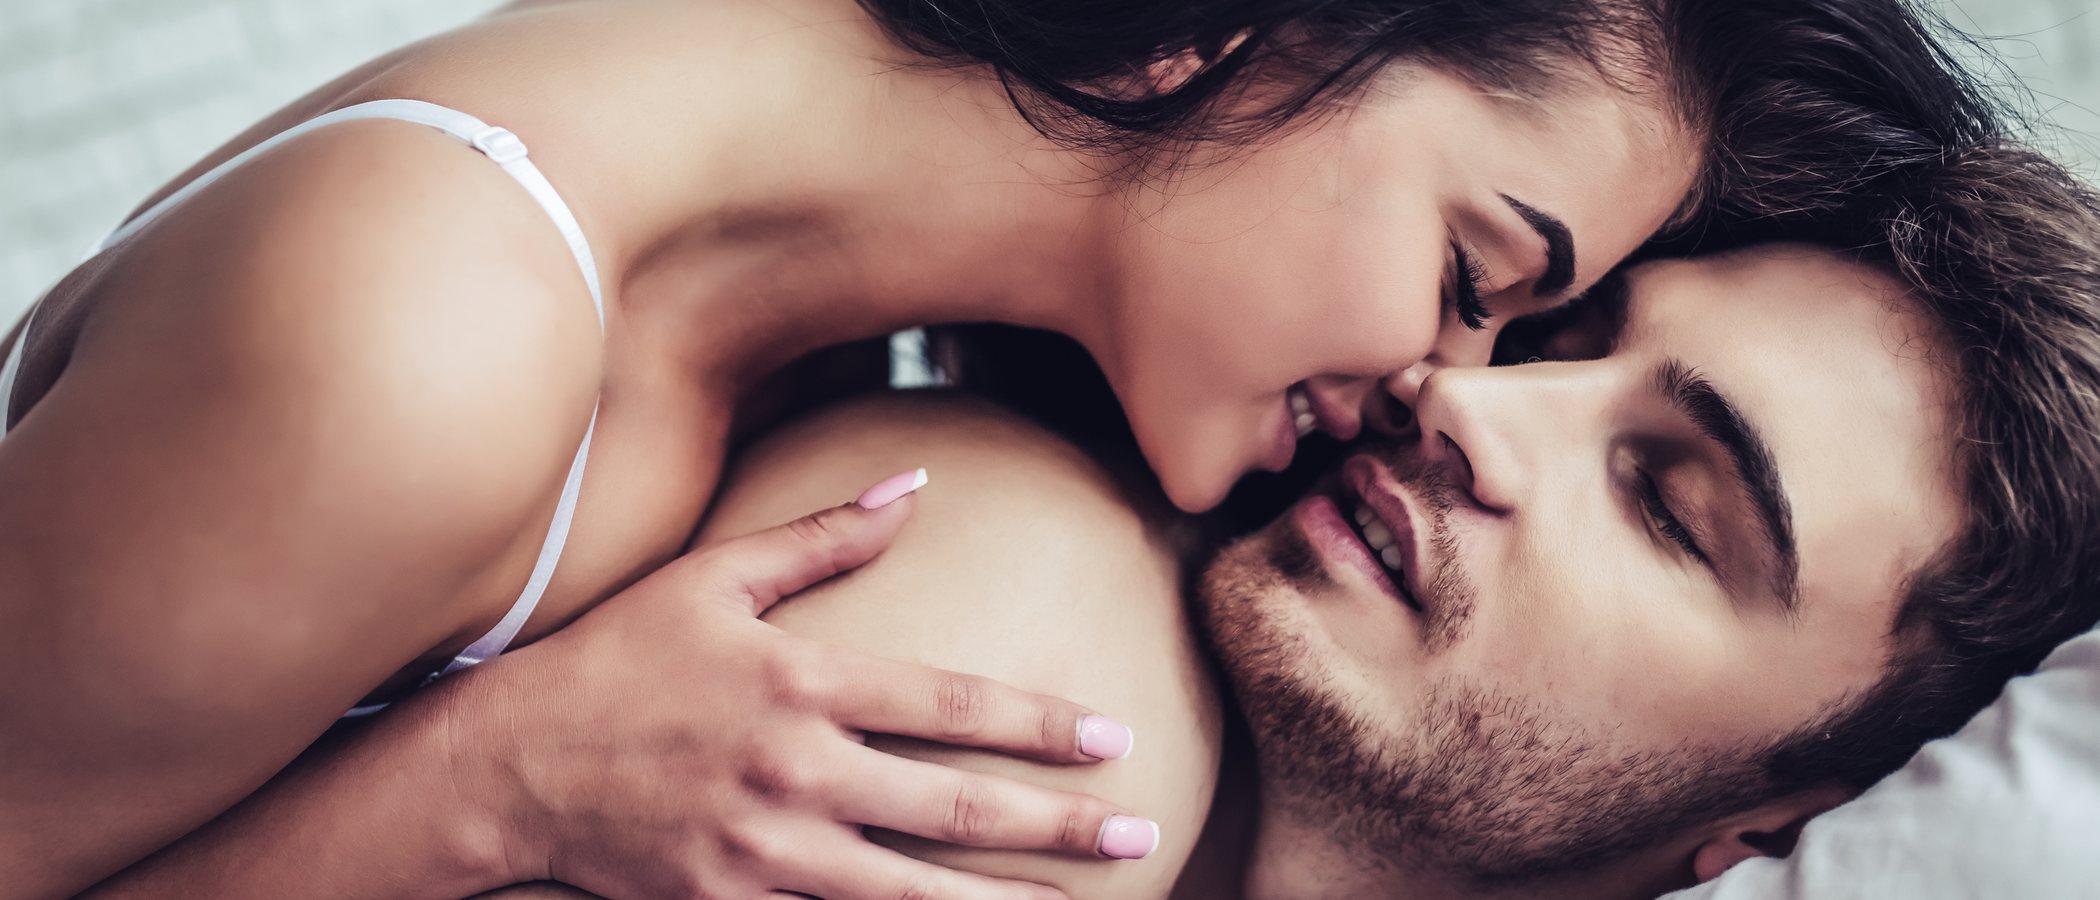 Horóscopo sexual octubre 2019: Piscis